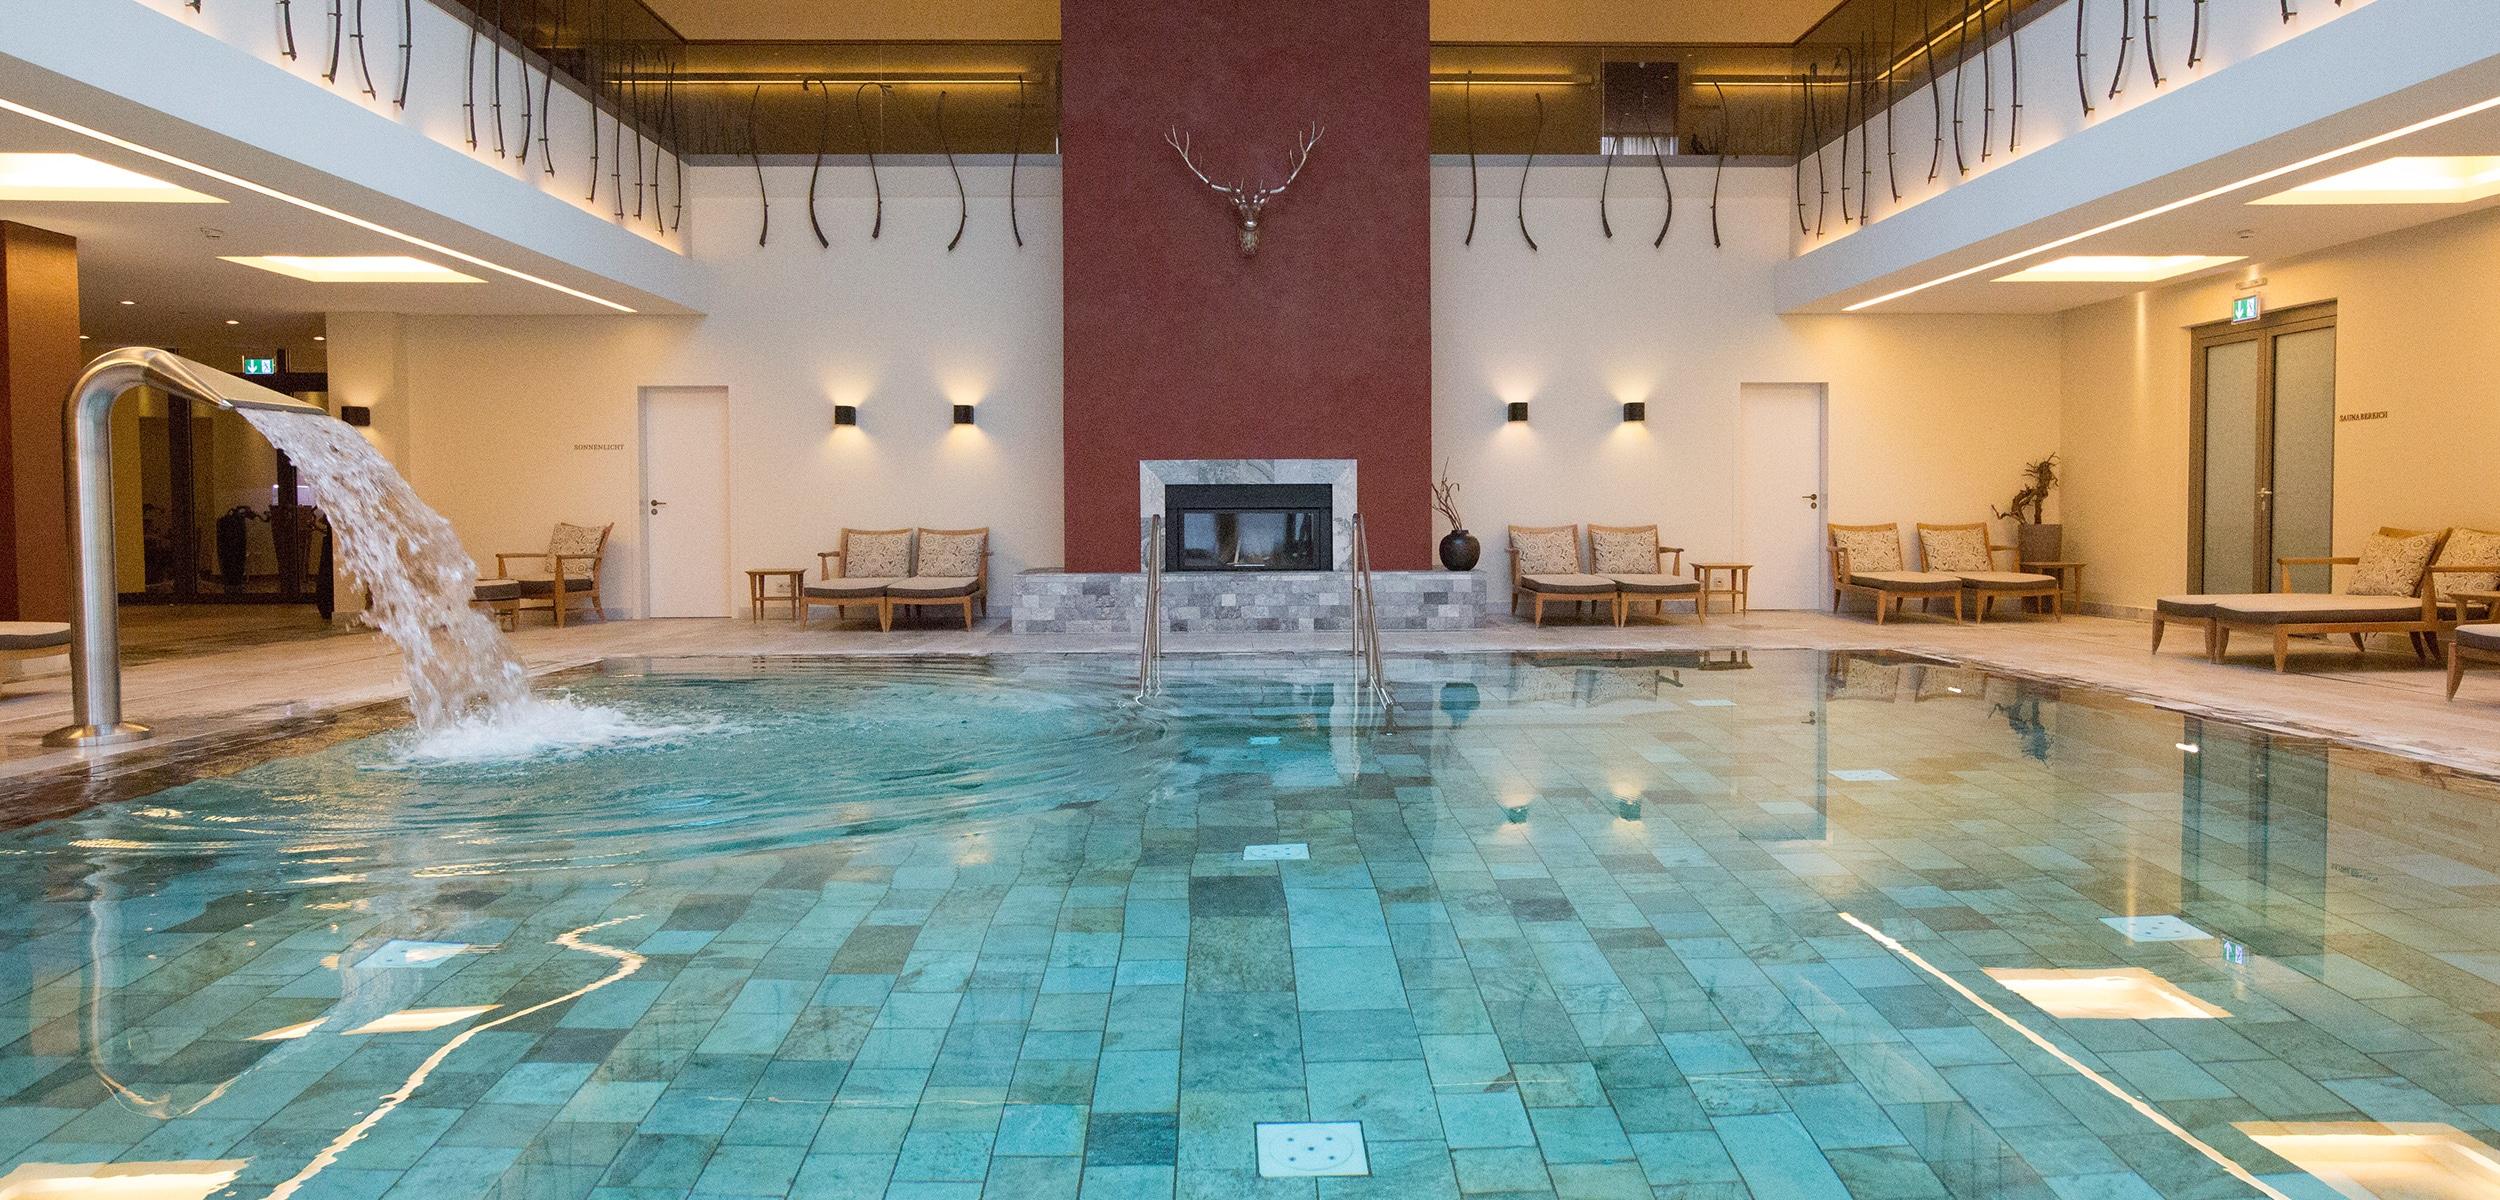 Pool in Spawelt Friedrichsruhe